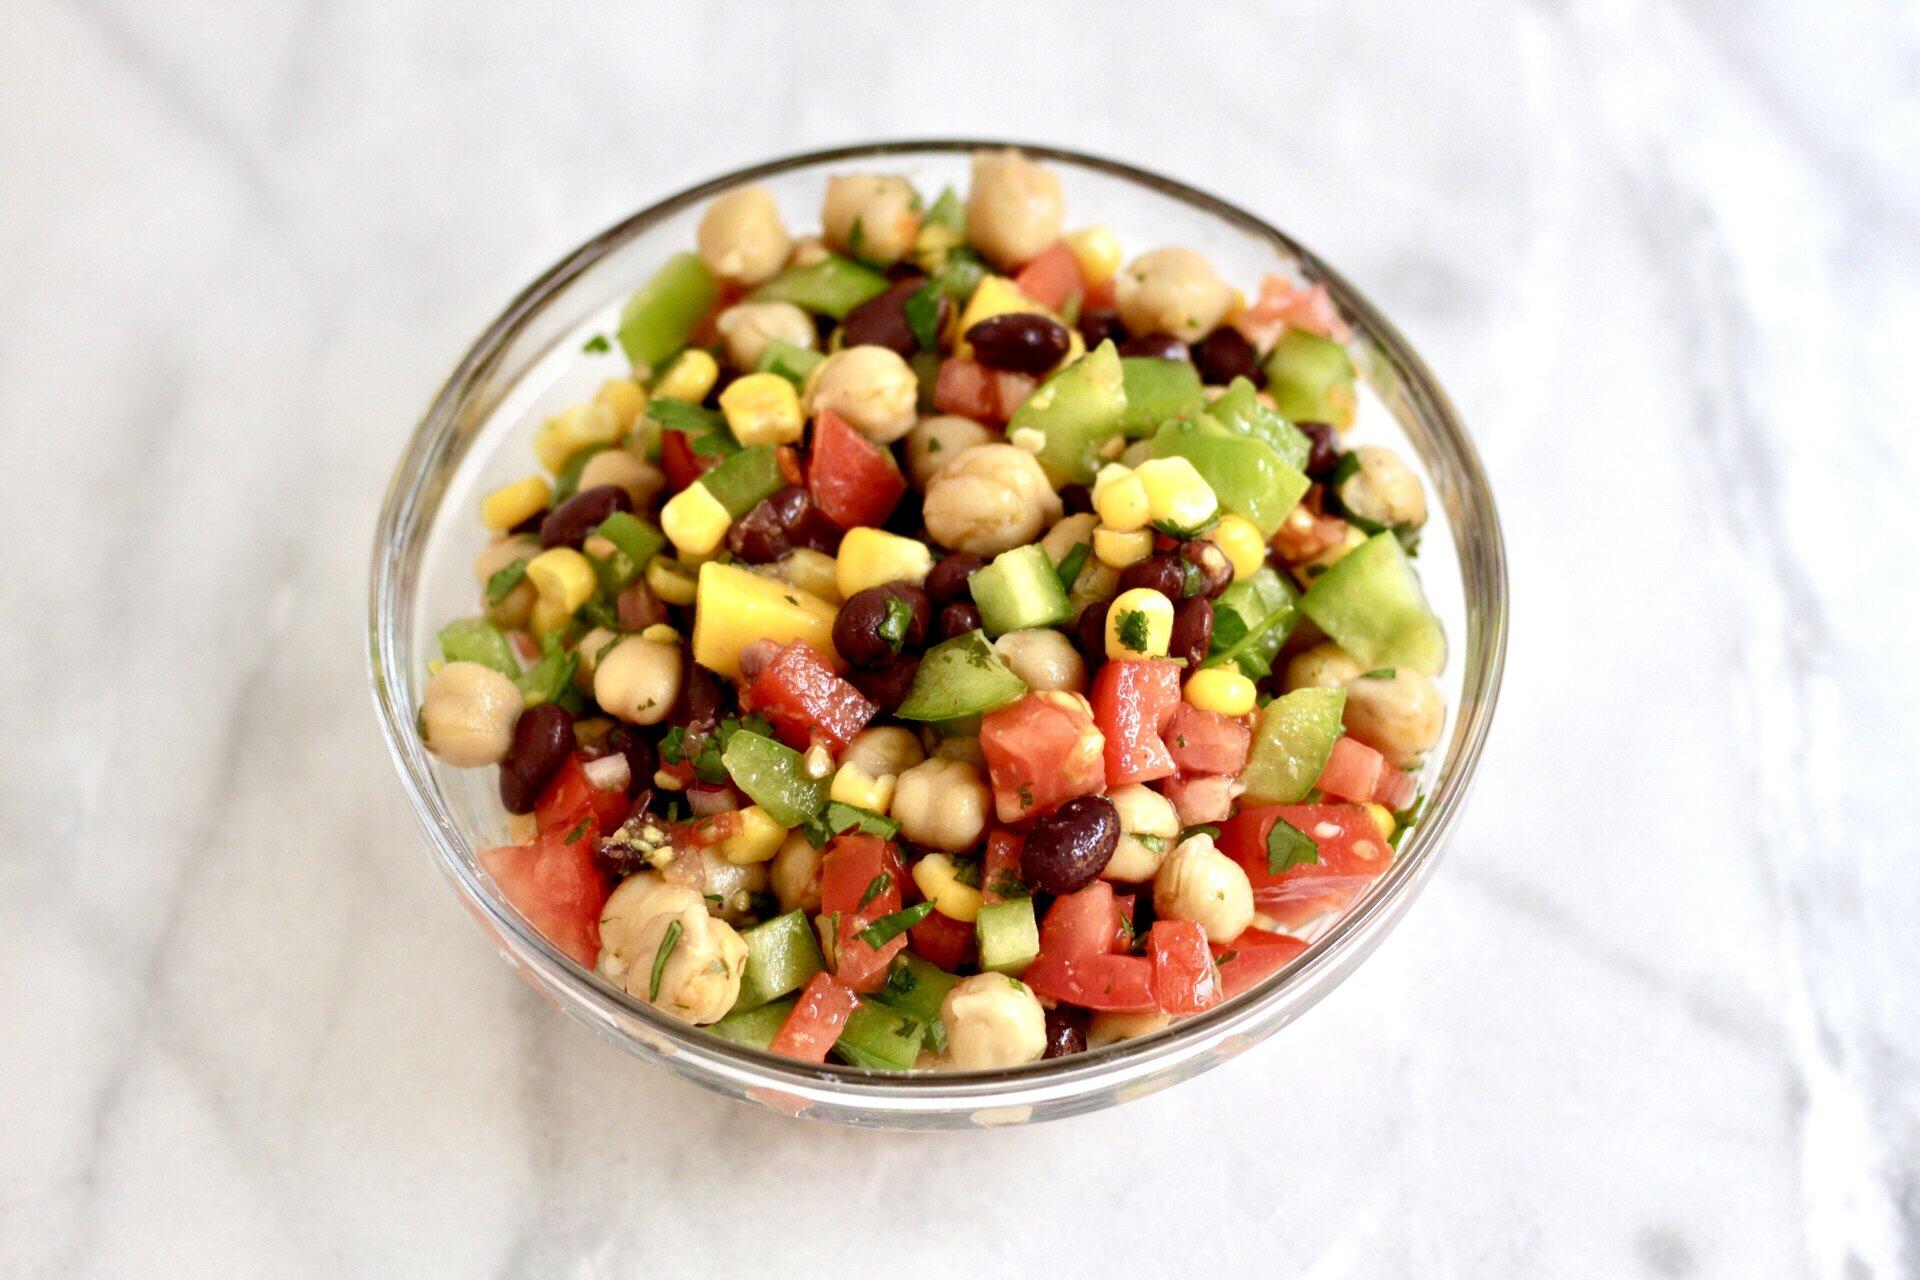 fiesta bean salsa recipe